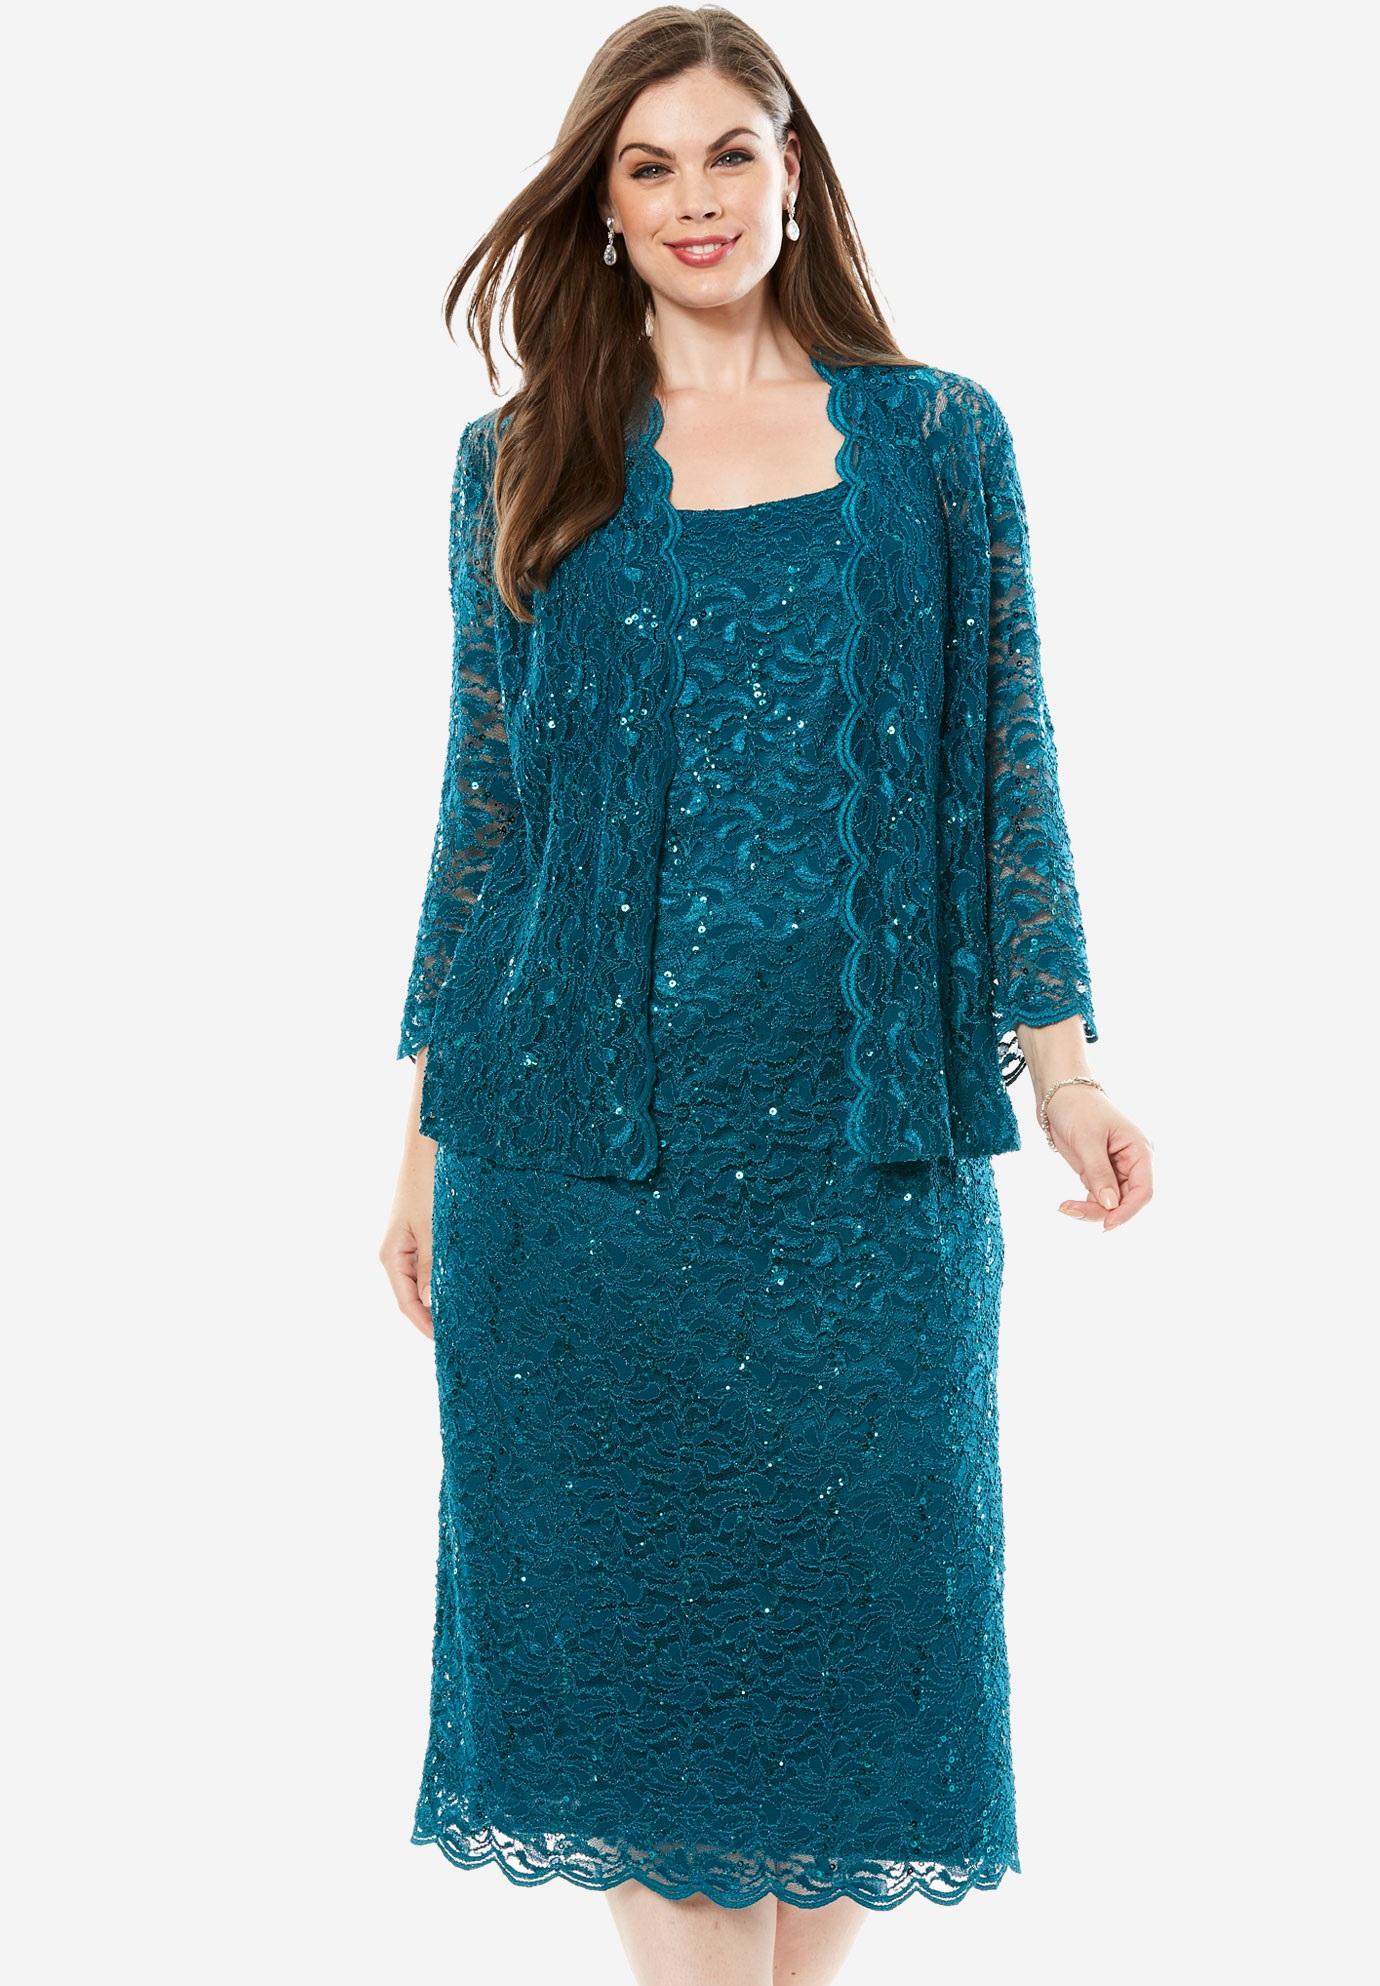 Two-Piece Lace Jacket Dress by Alex Evenings | Plus Size Evening ...